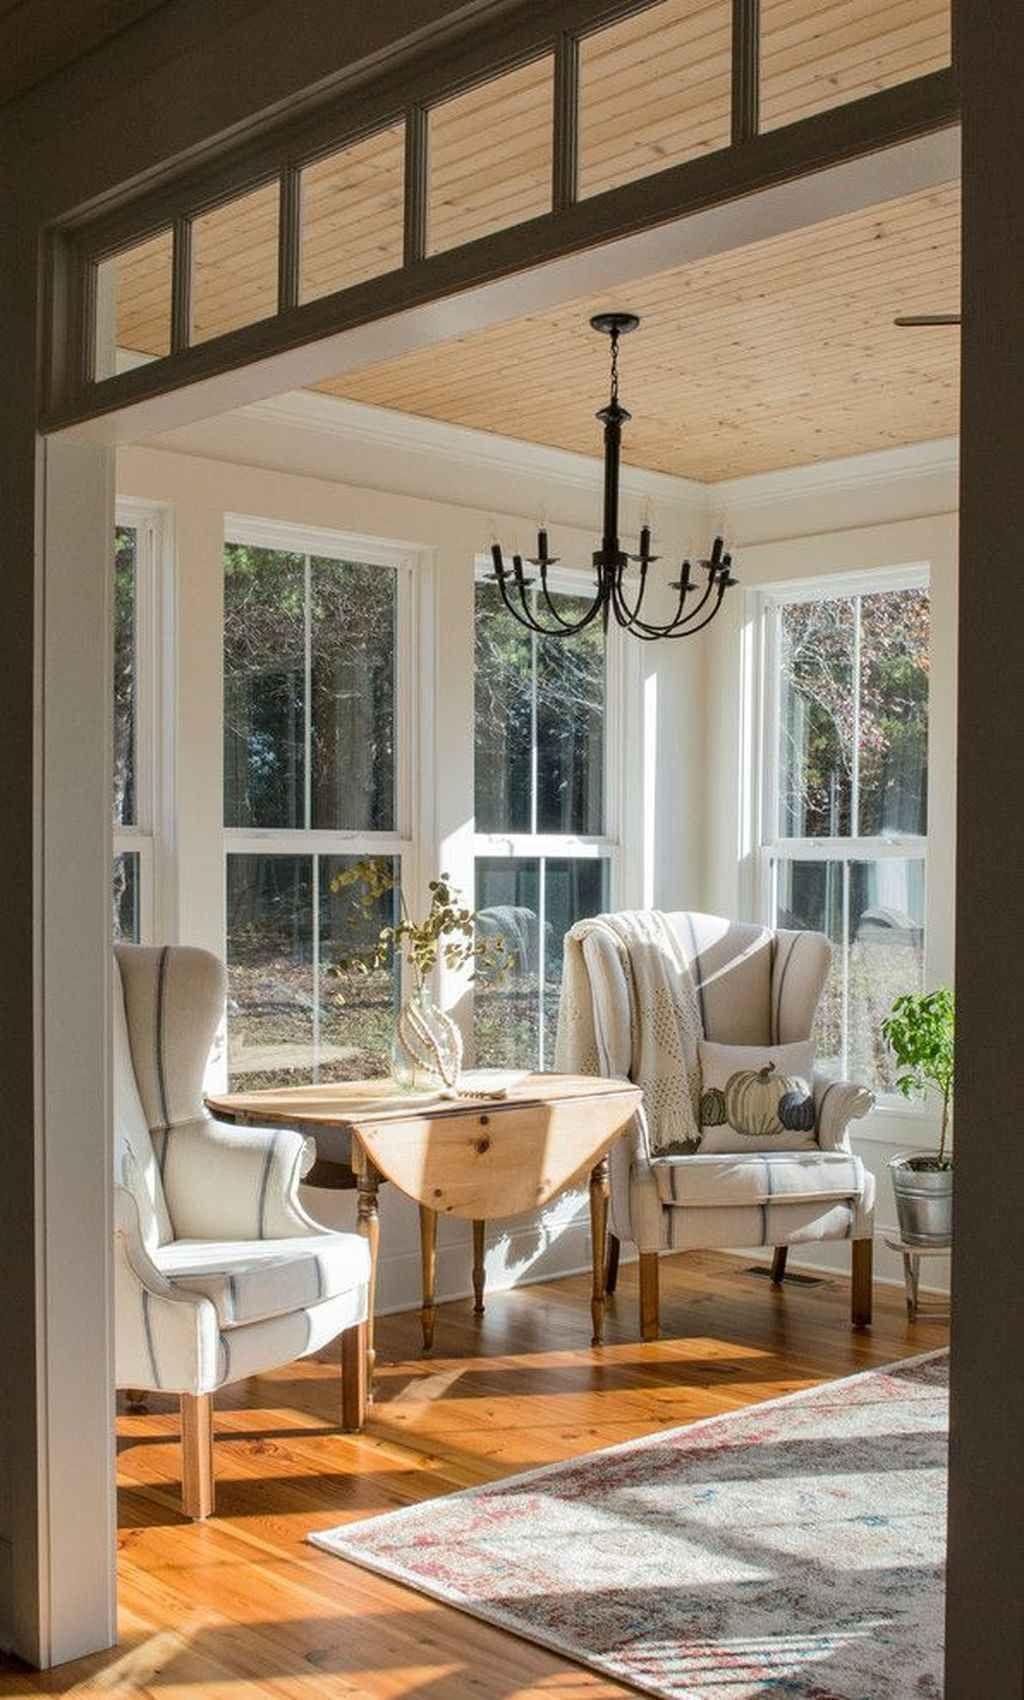 10 Cozy Modern Sunroom Decor Ideas Frontbackhome Sunroom Decorating Sunroom Designs Sunroom Furniture